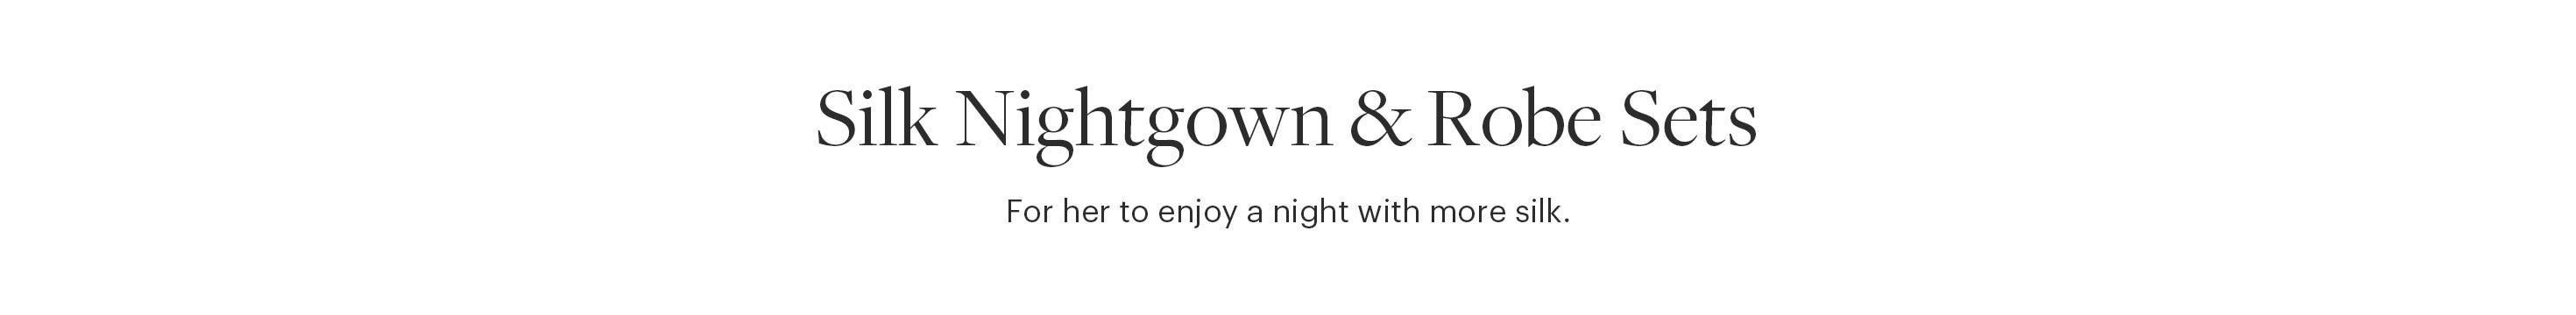 Silk Nightgowns & Robes Set